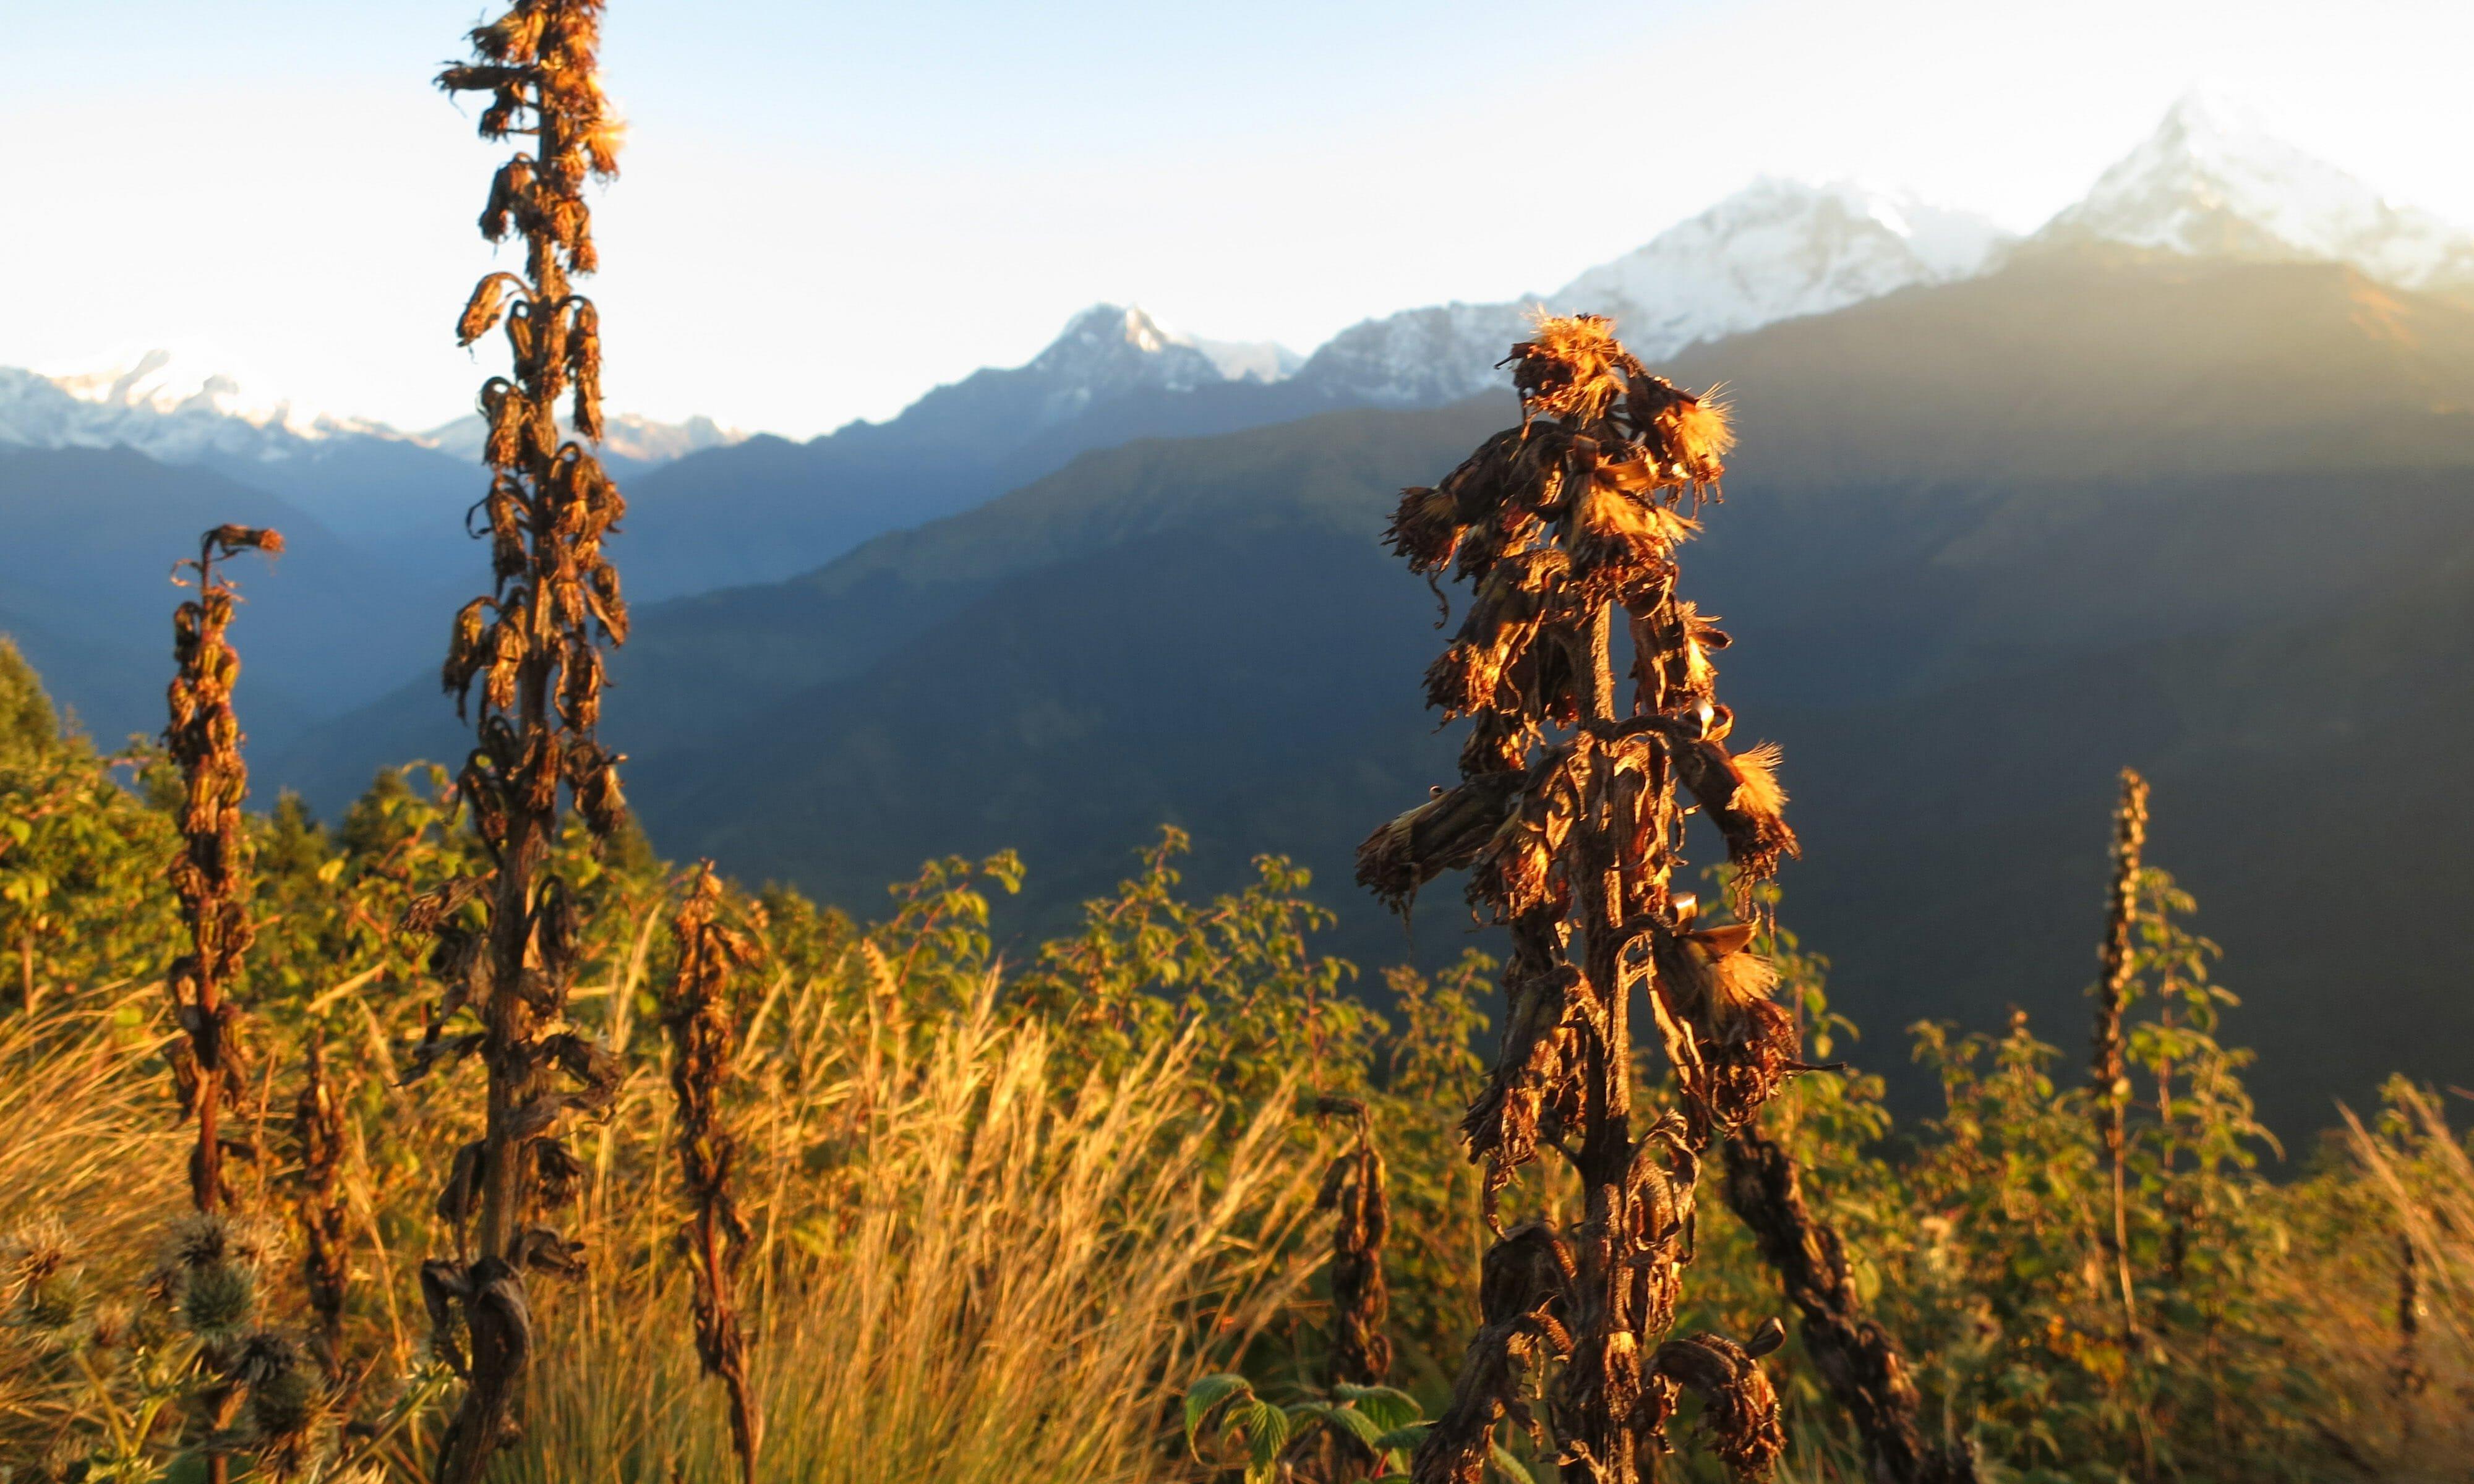 CHECT Photo - Nepal